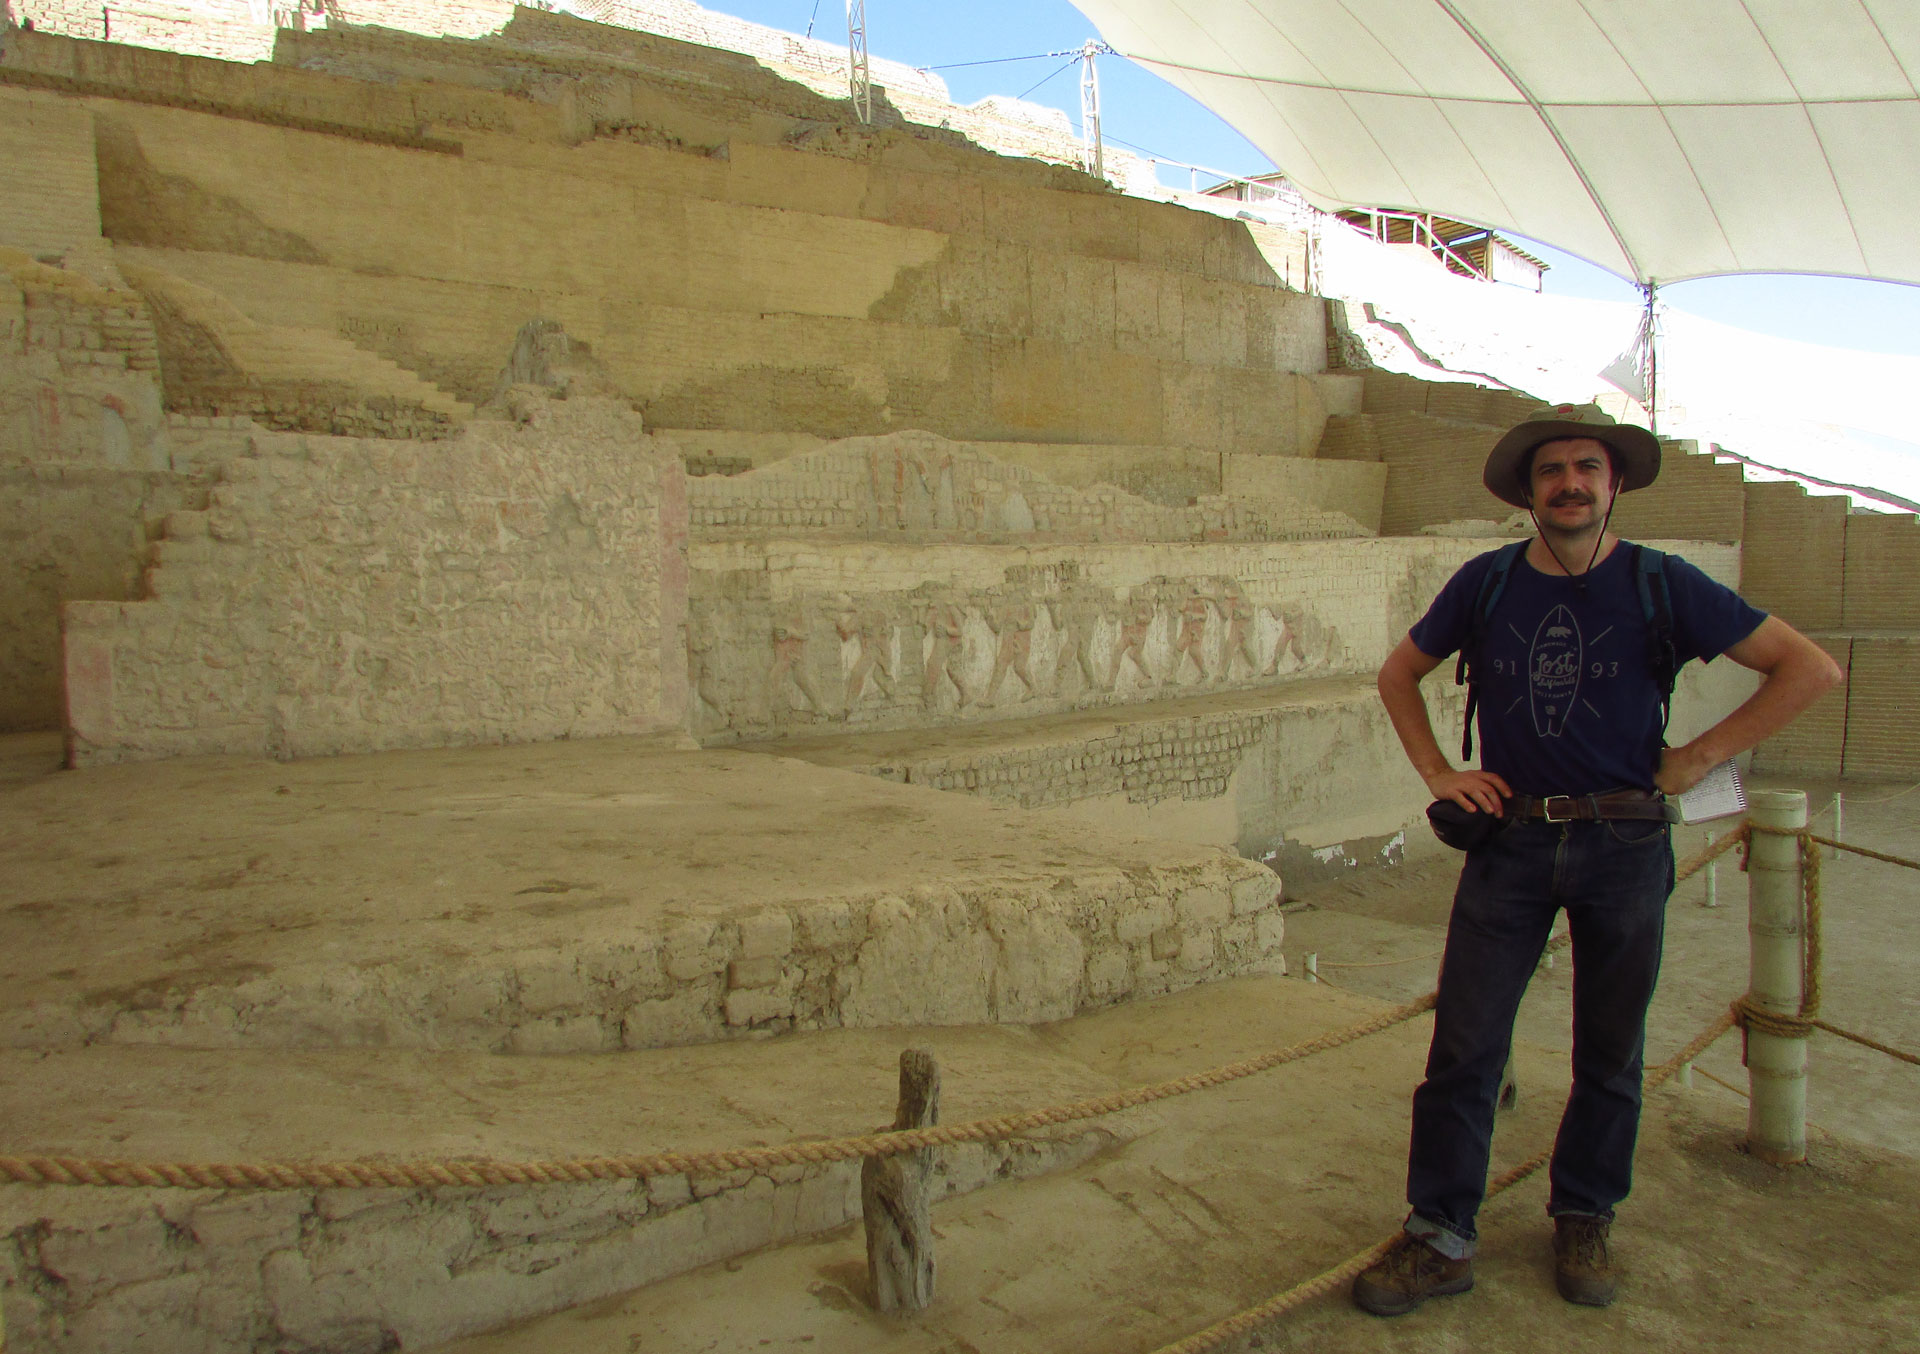 Senora de Cao, archéologie nord du Pérou